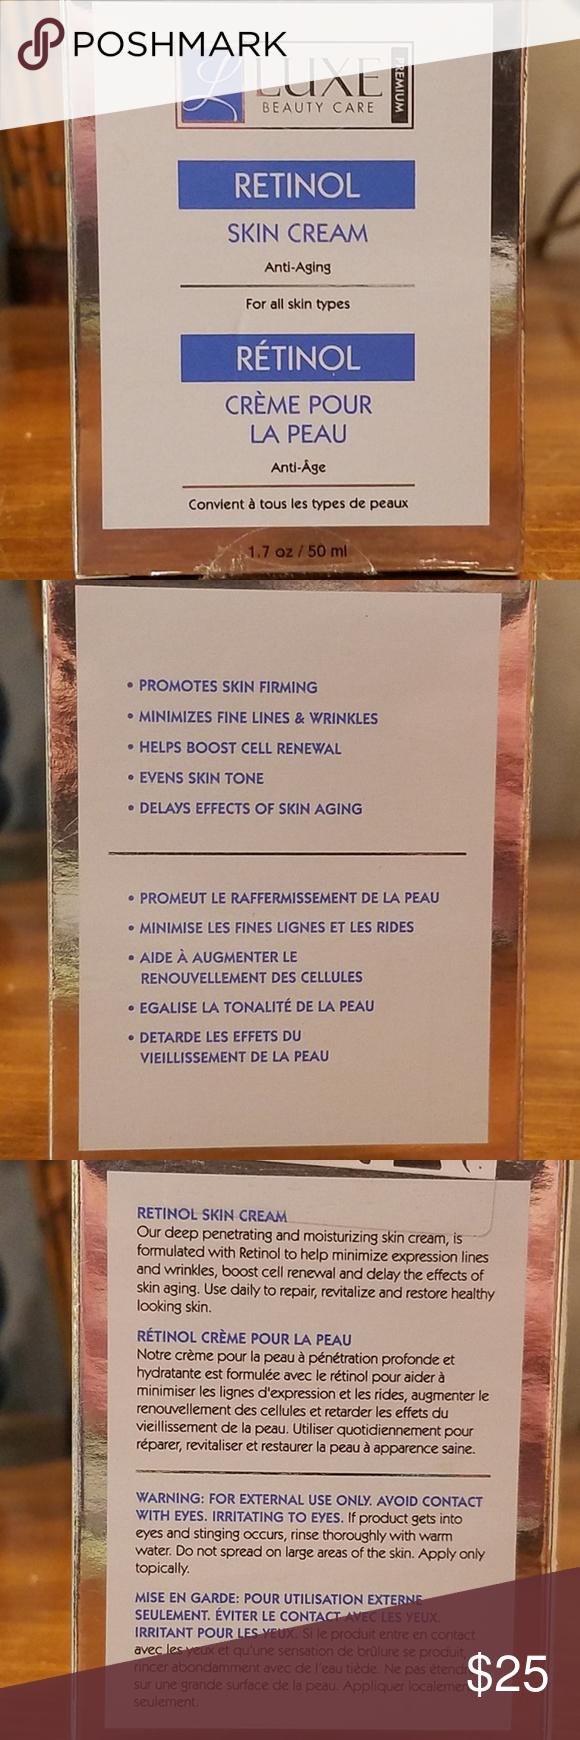 Sale Luxe Retinol Anti Aging Cream In 2020 Anti Aging Cream Retinol Face Firming